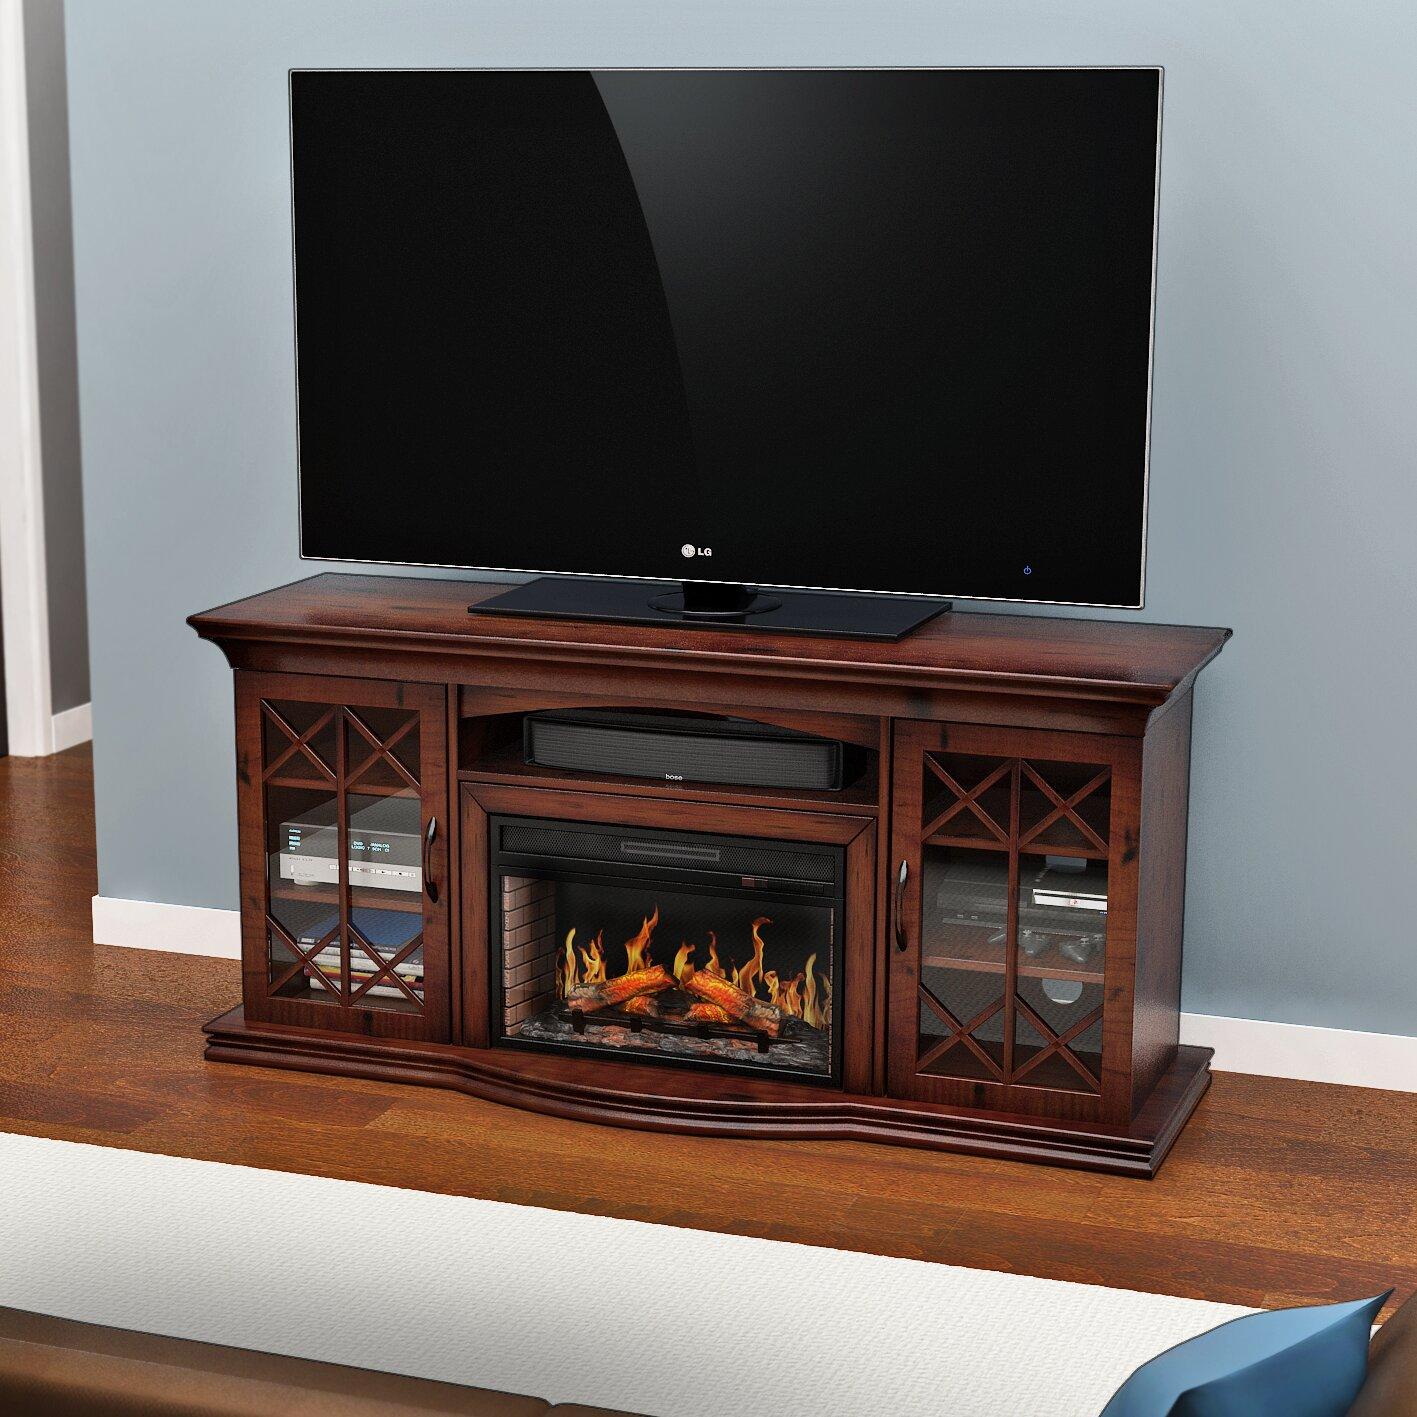 Tag Flat Panel Tv